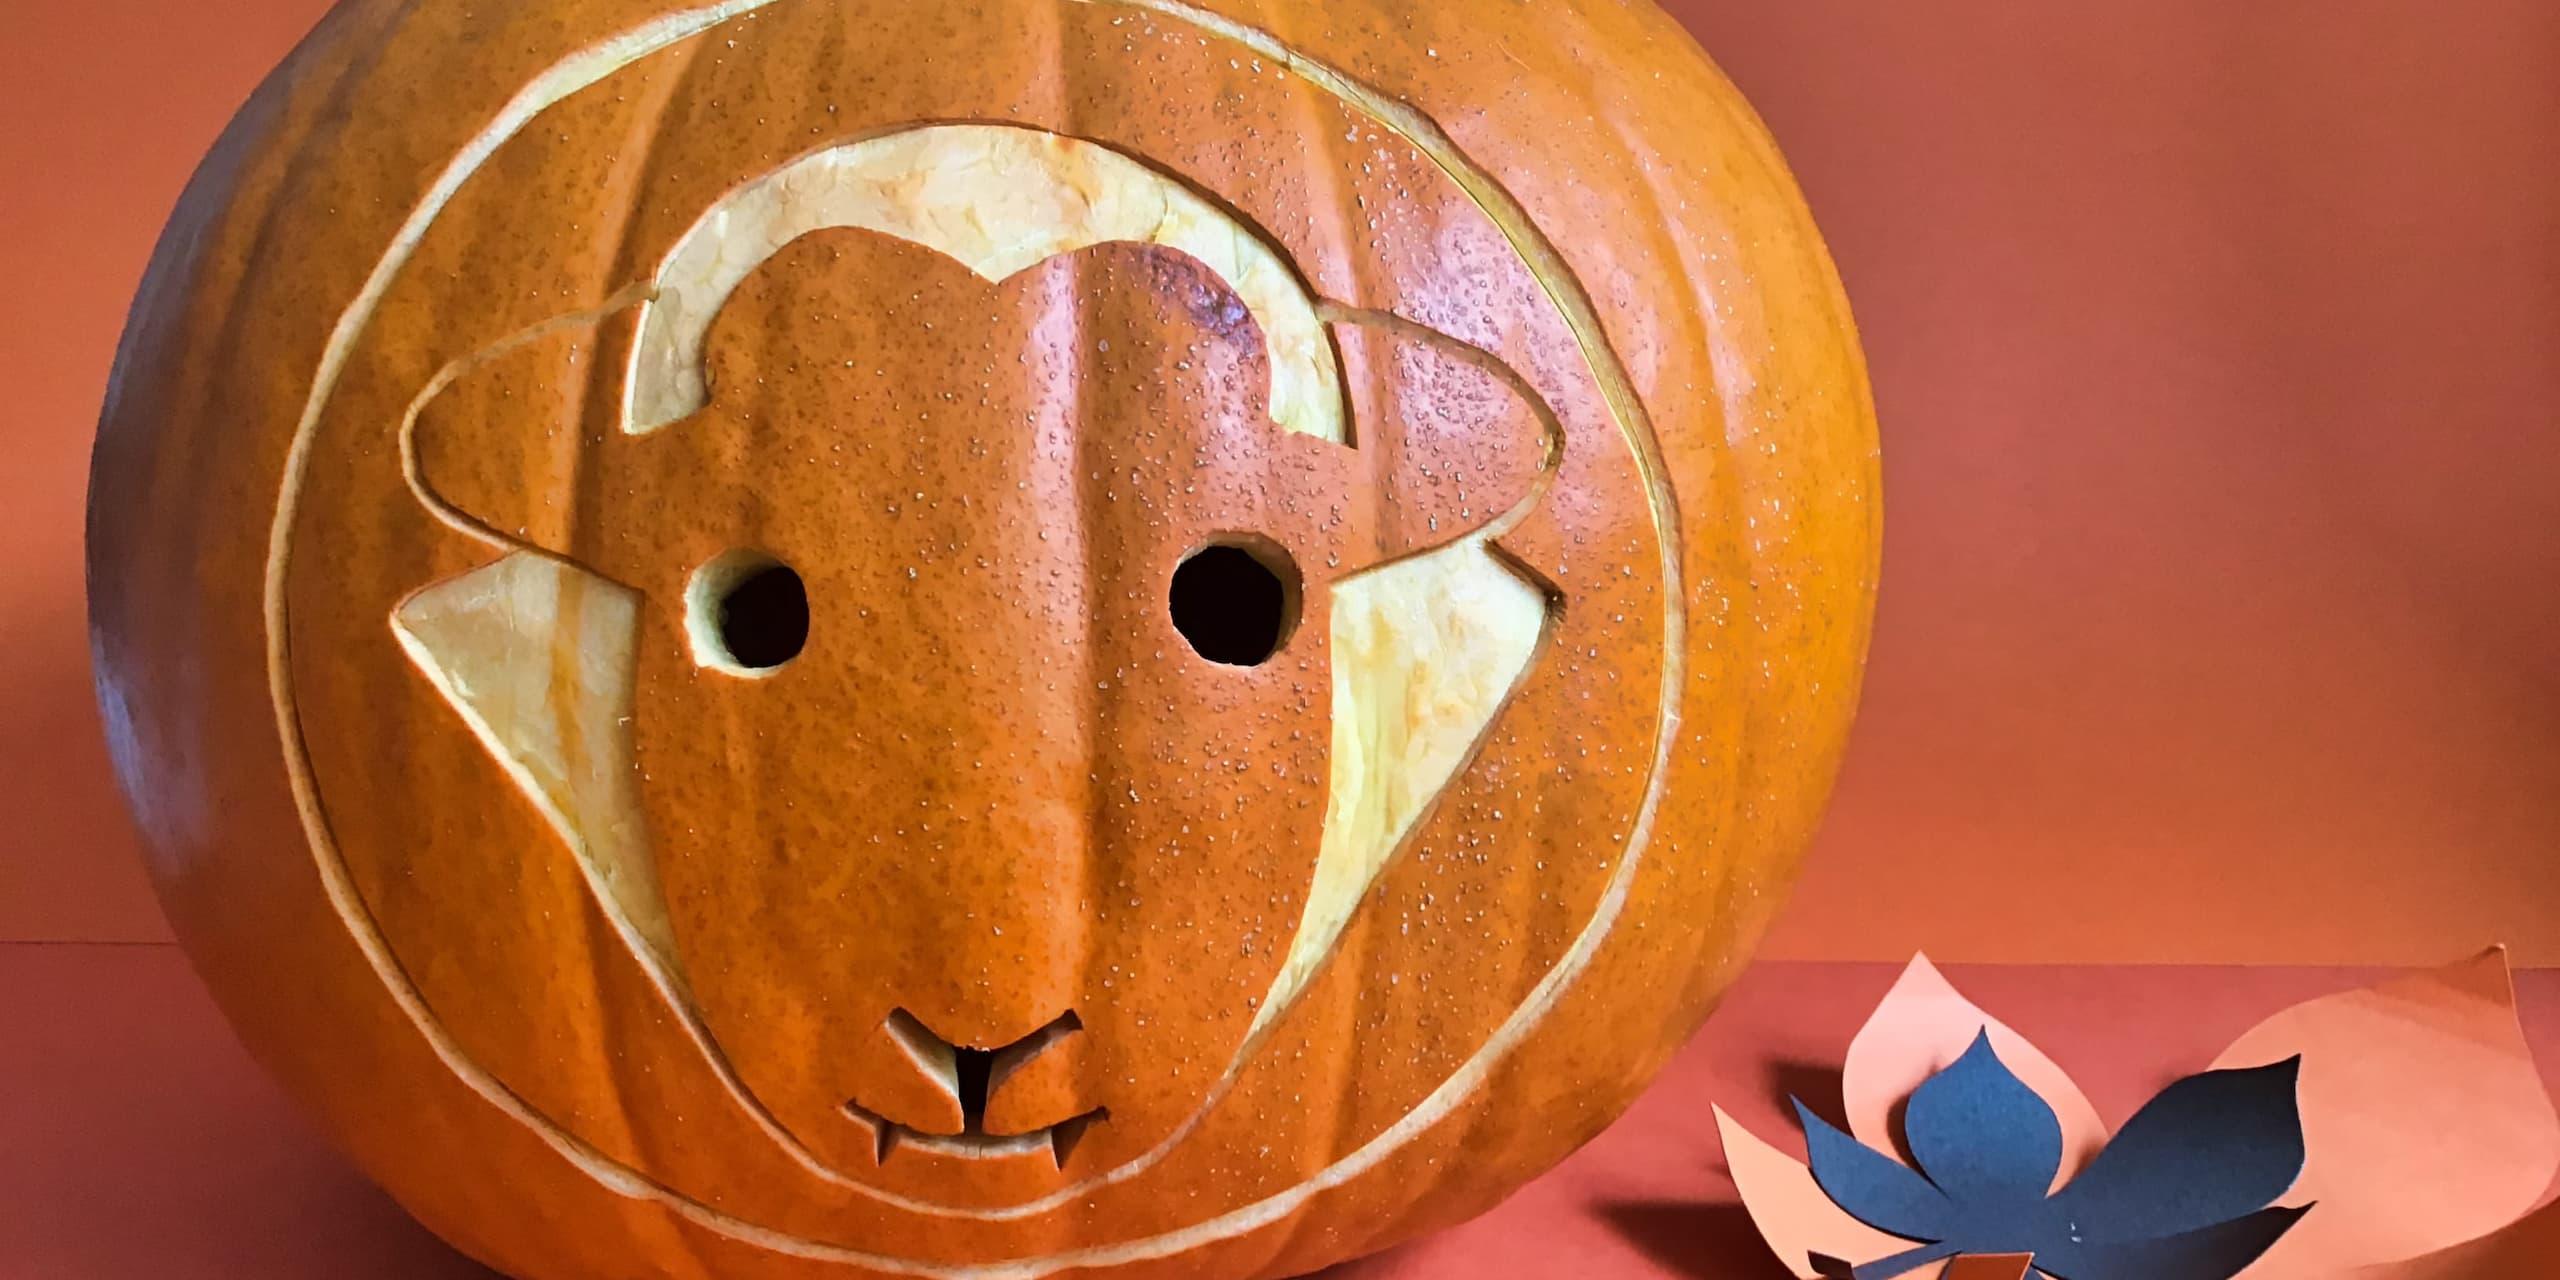 How To Make A Herdy Halloween Pumpkin